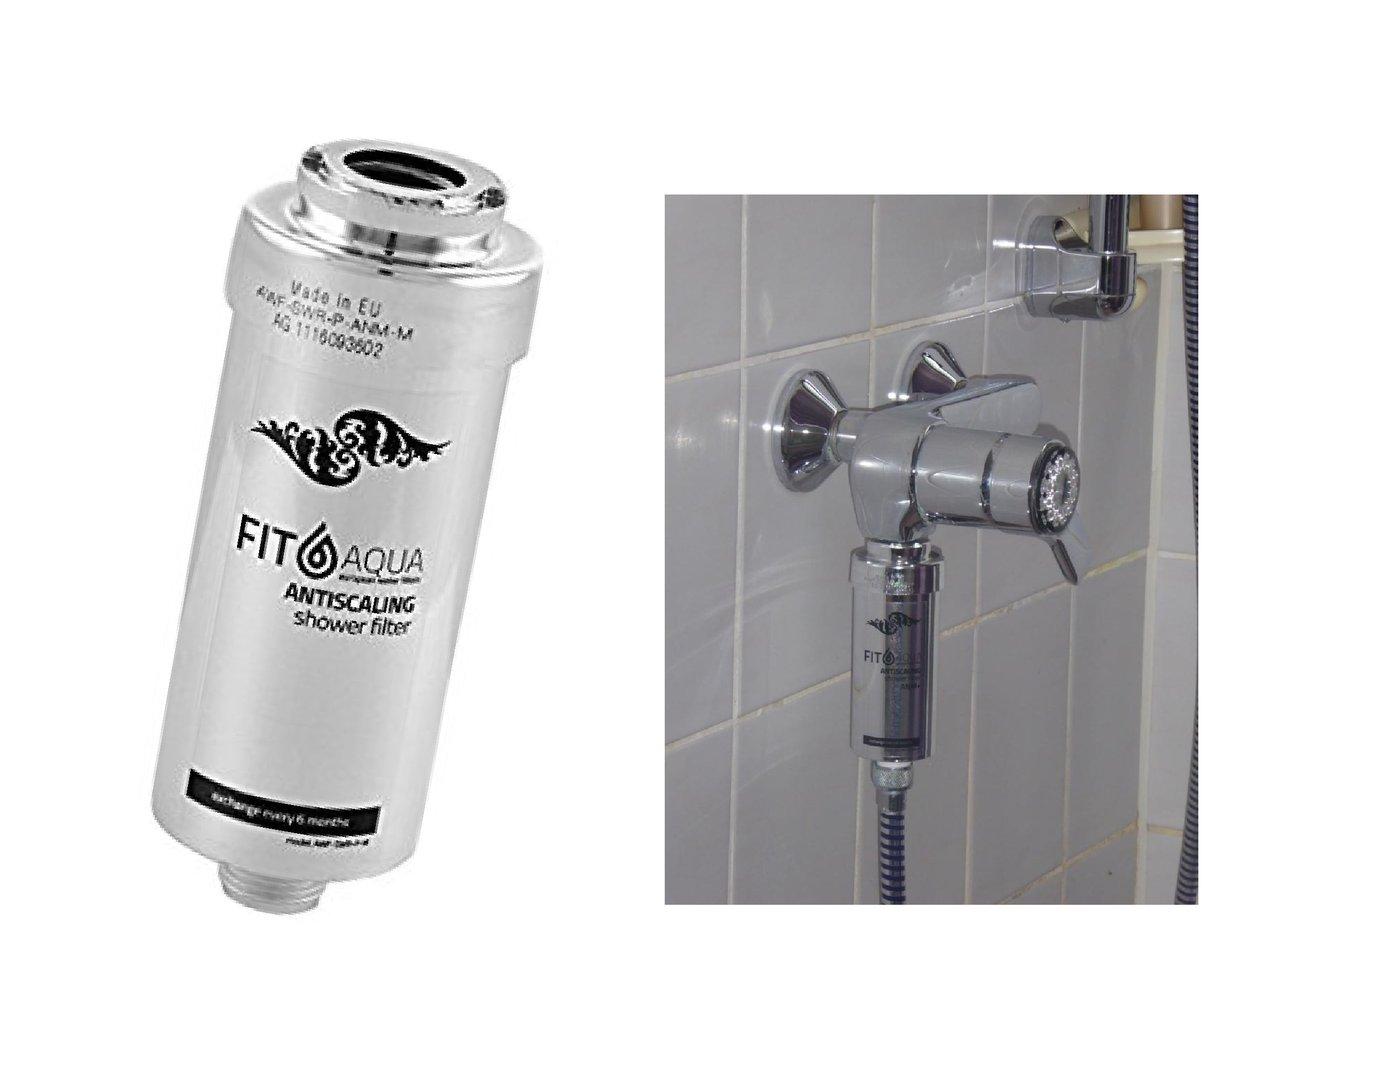 Gorenje Kühlschrank Filter : Duschfilter fitaqua antiscaling wasserfilter für dusche gegen chlor